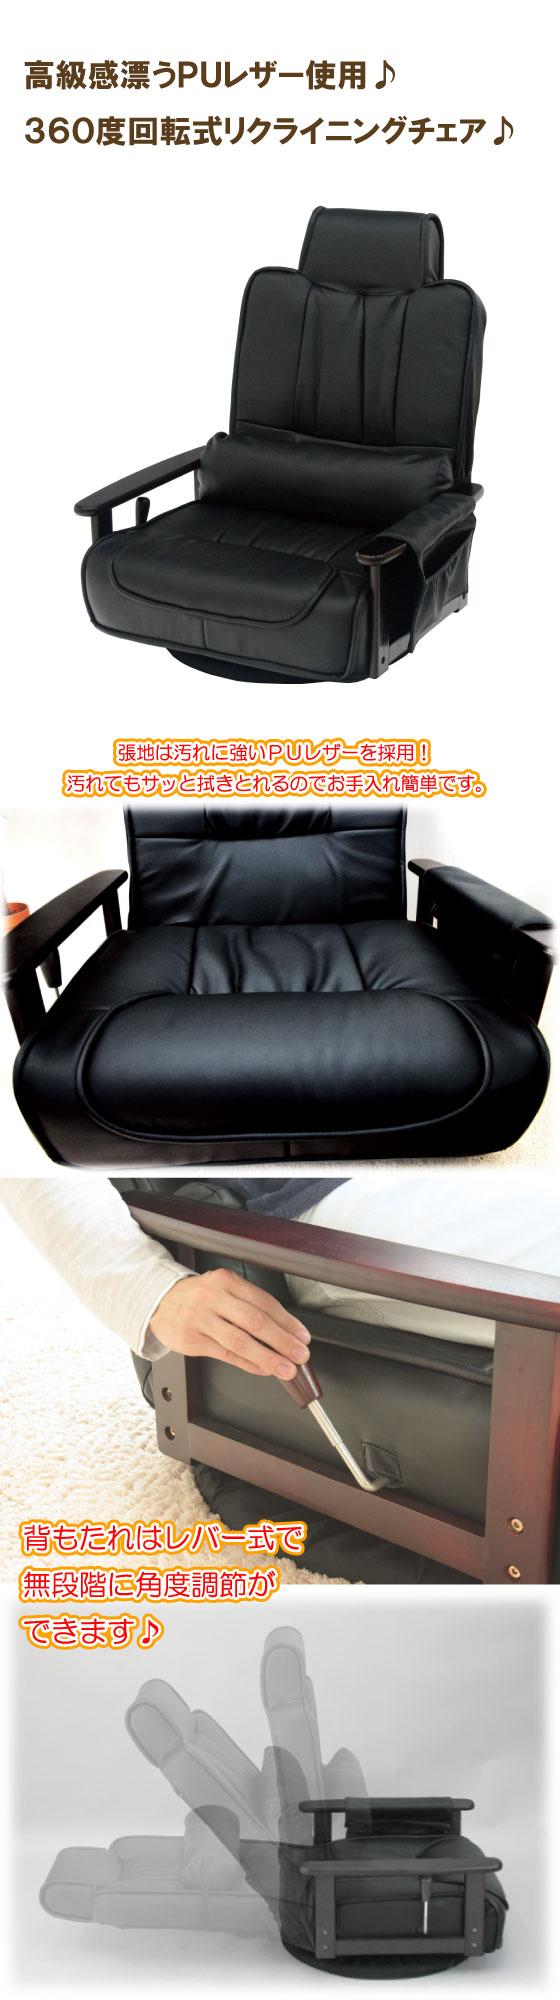 PUレザー製・折り畳める回転式座椅子